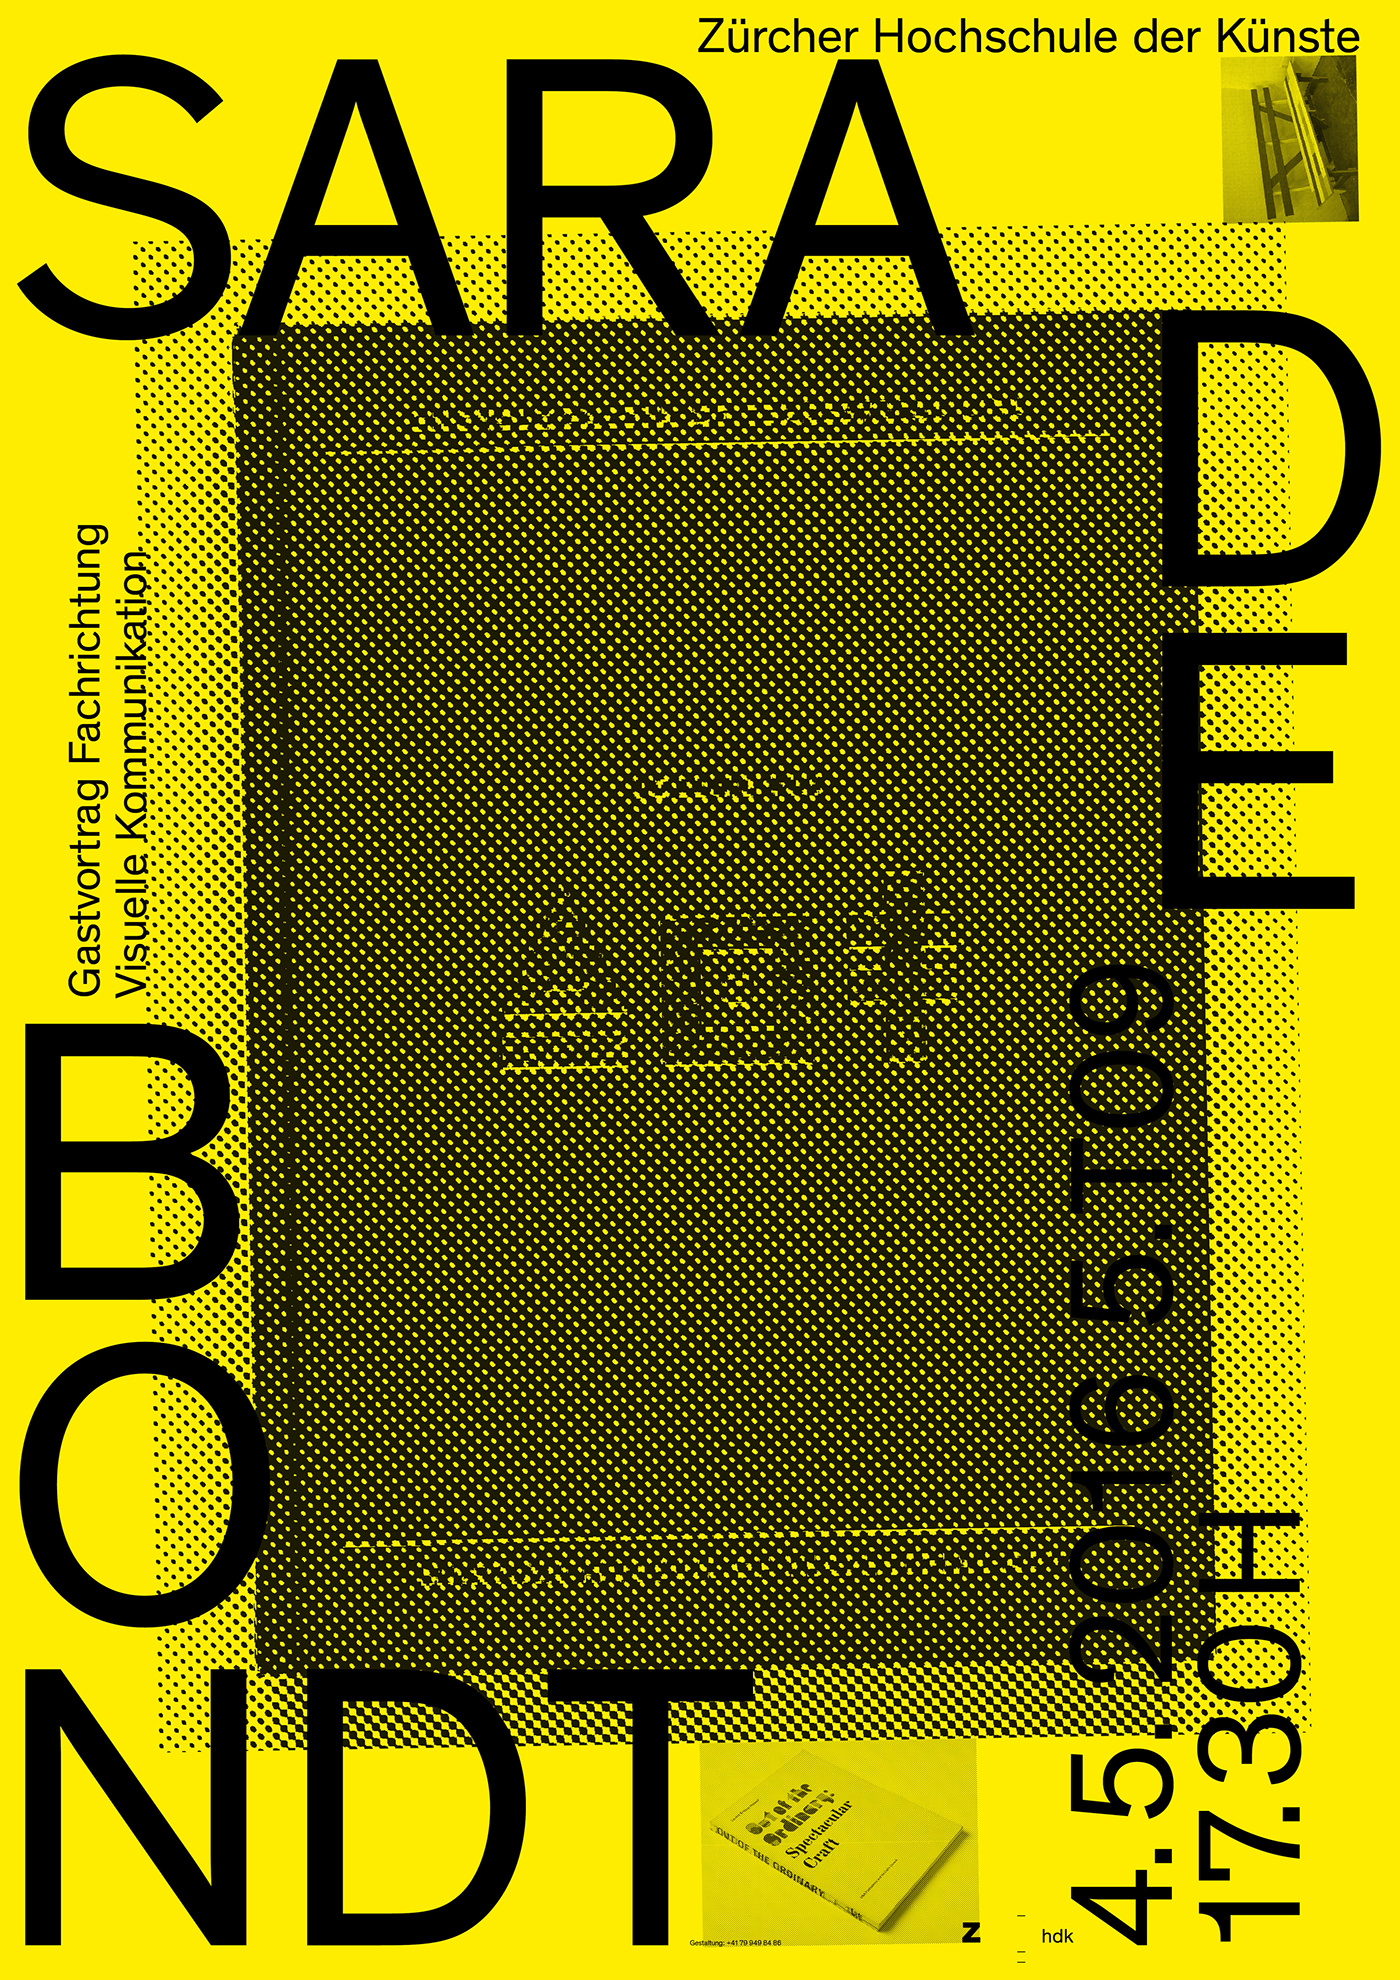 graphic design  poster swiss graphic design typography   culture art art direction  design designer